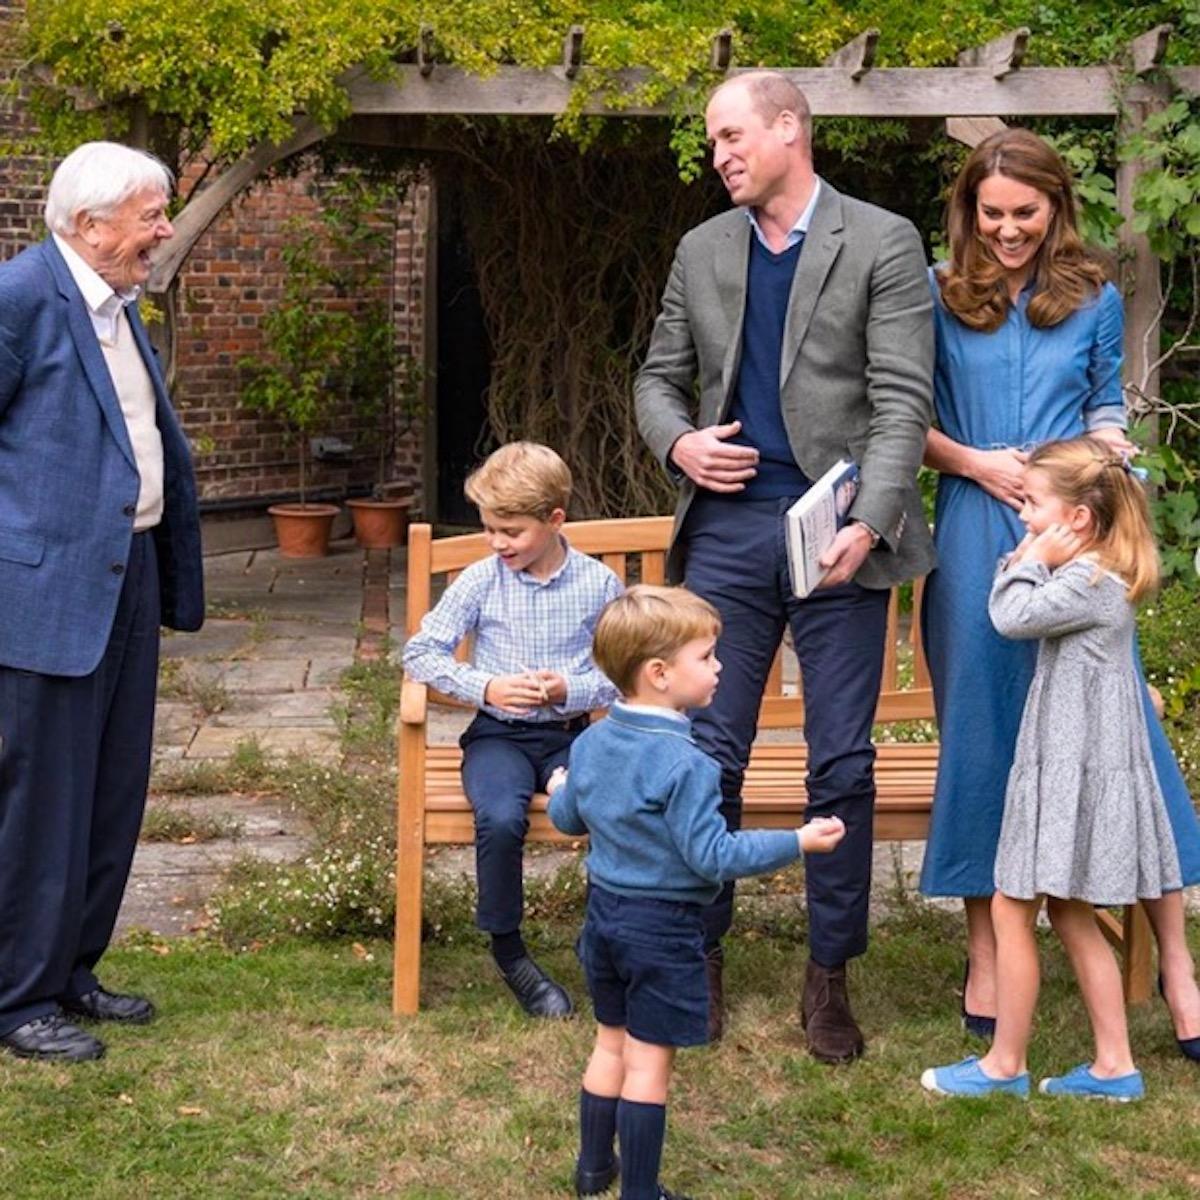 Kate Middleton figlia principessa charlotte oggi nuova foto